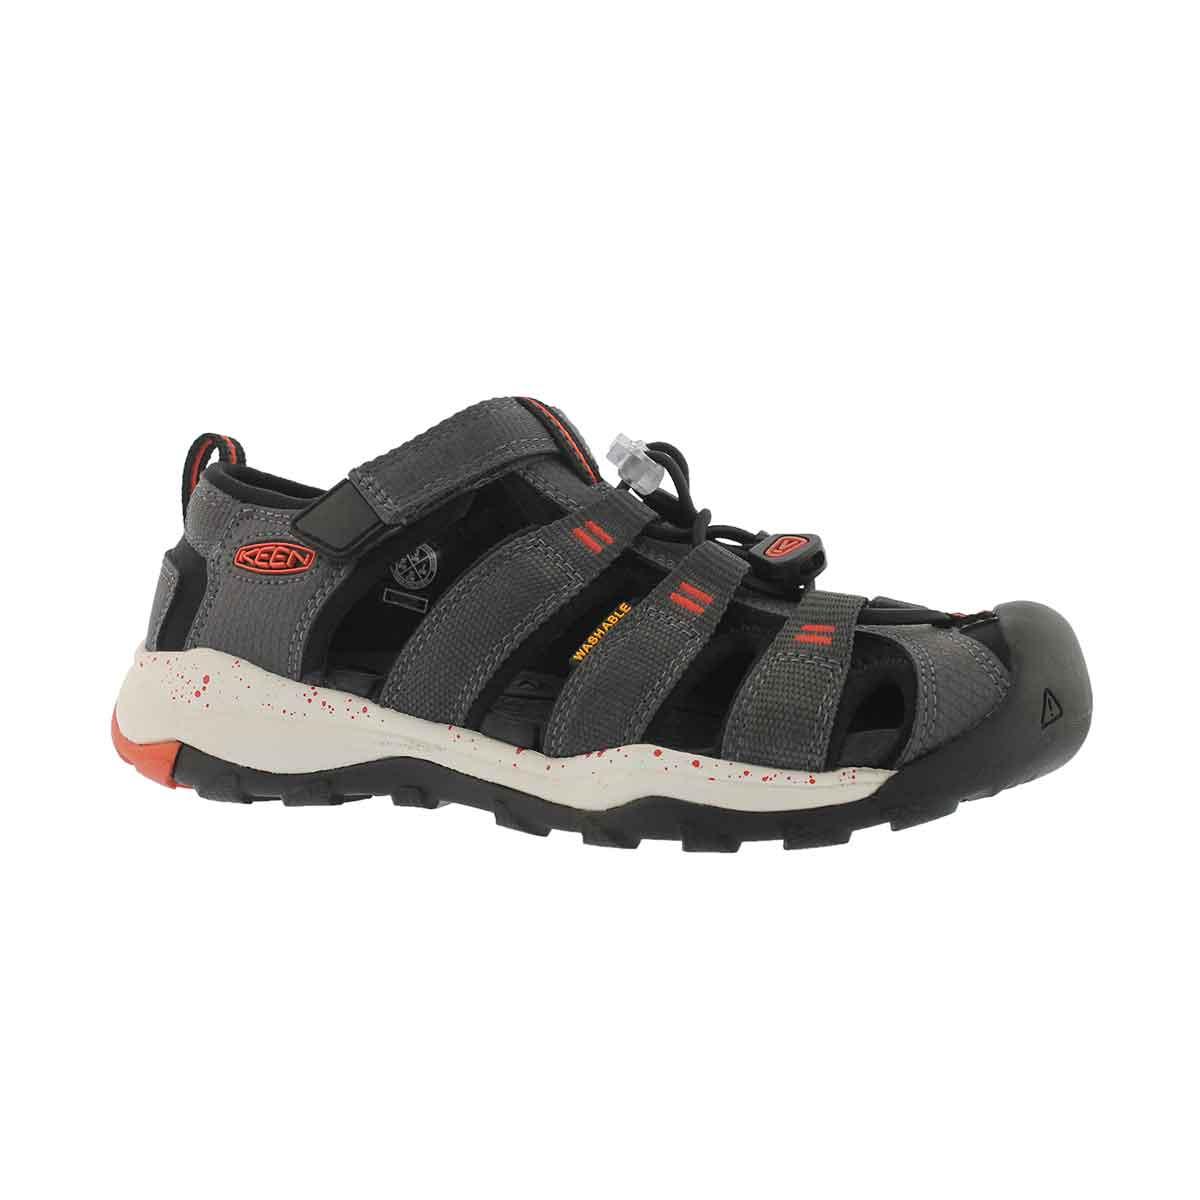 Boys' NEWPORT NEO H2 mag/spcy org sandals